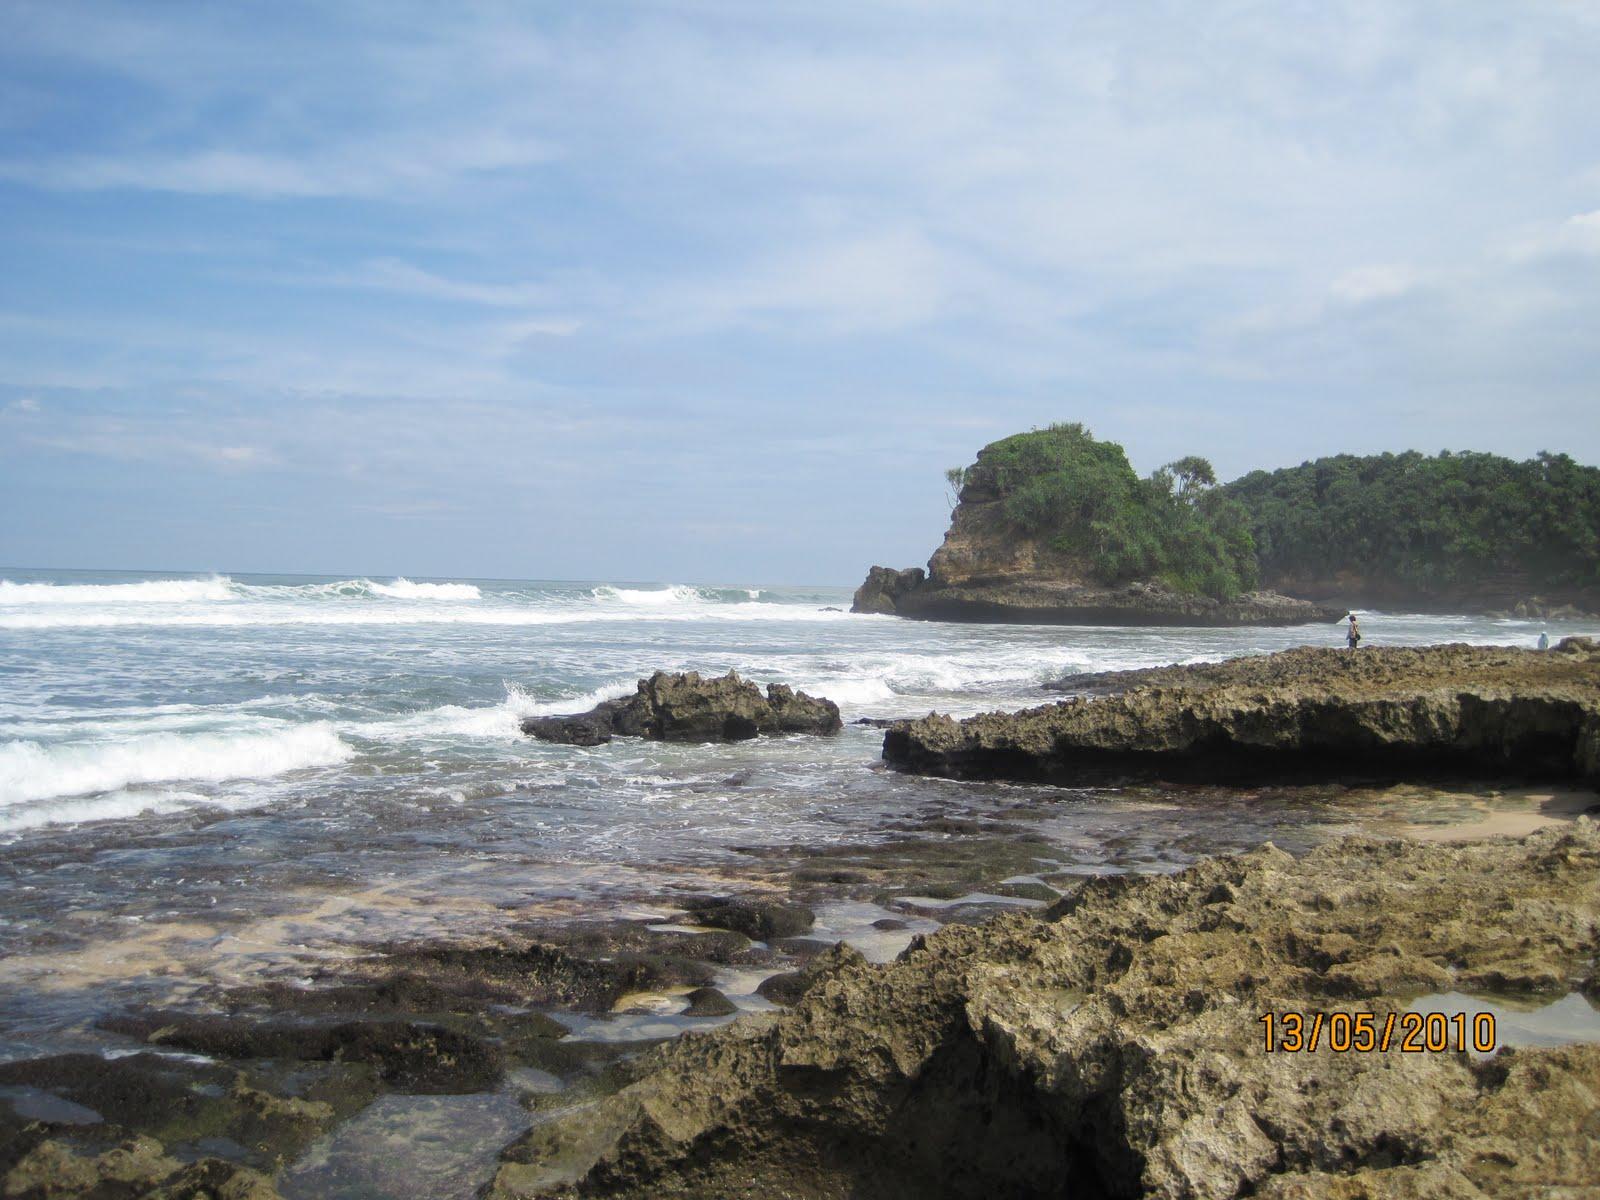 Pantai Jonggring Saloko Dhani911 Blog Cerita Pewayangan Kab Malang